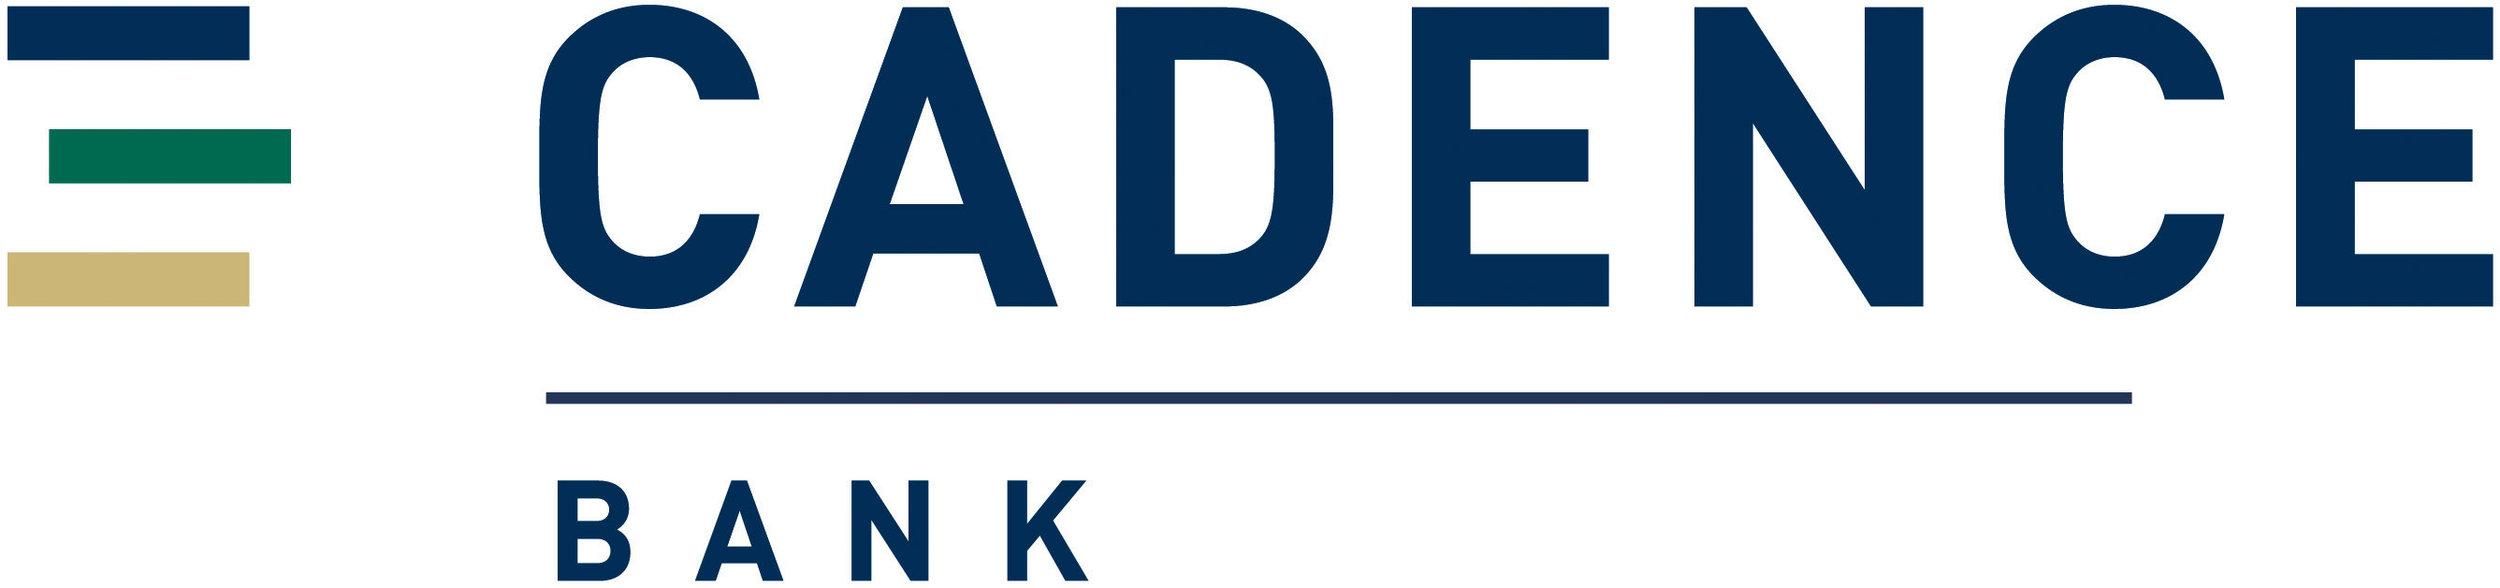 CADENCE-logo-v1-stacked_(1)_highres.jpg